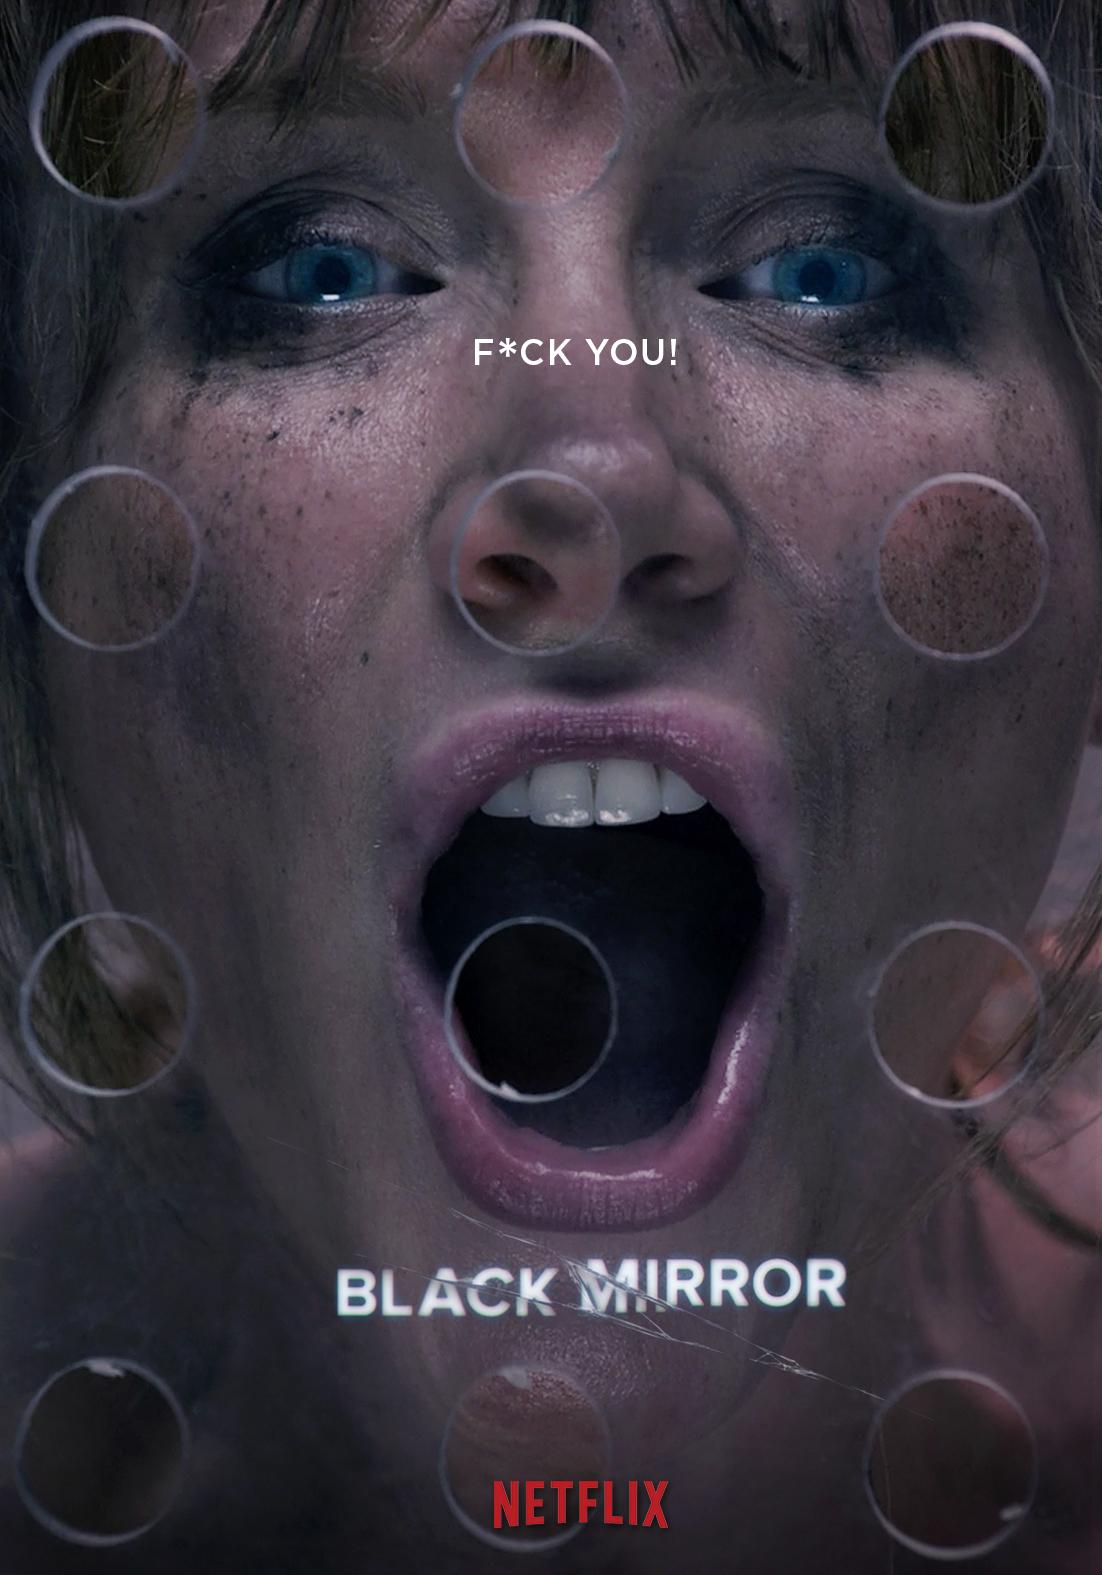 Black mirror season 3 on behance for Black mirror